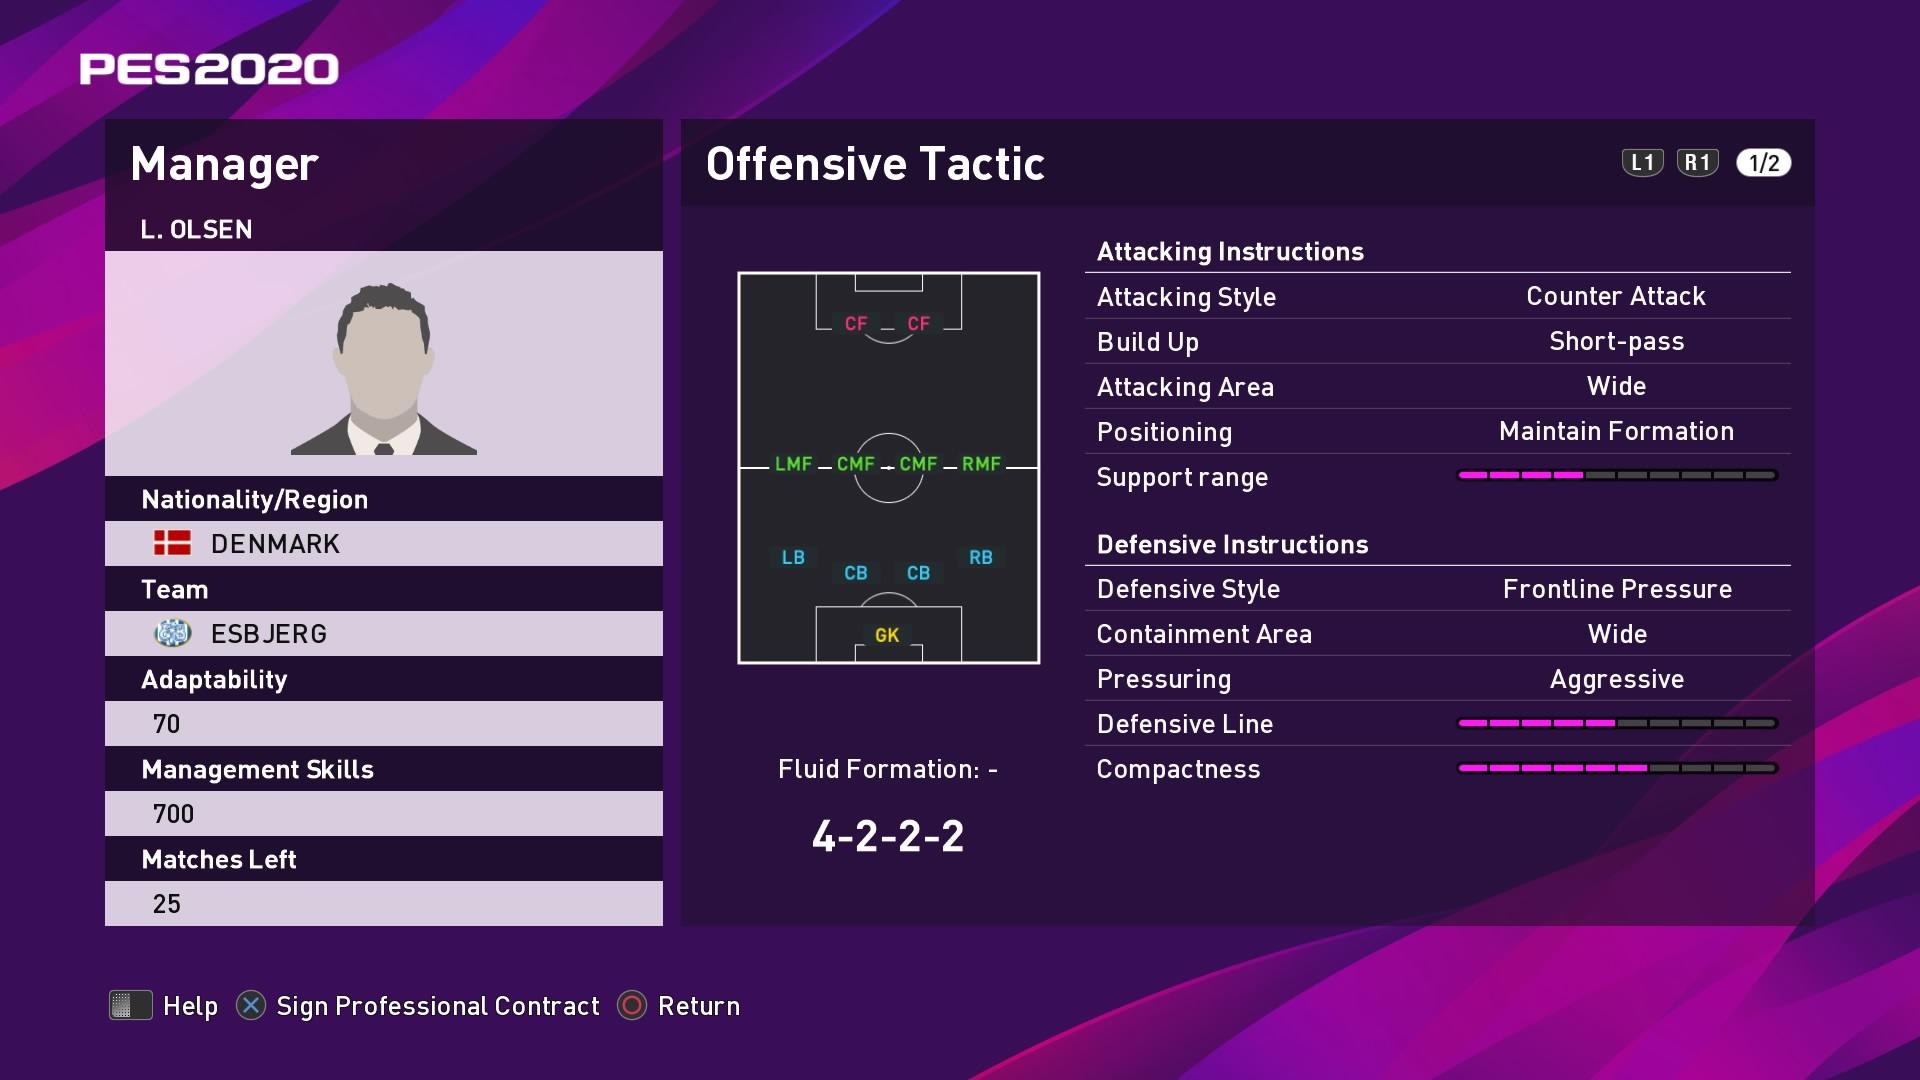 L. Olsen (Lars Olsen) Offensive Tactic in PES 2020 myClub